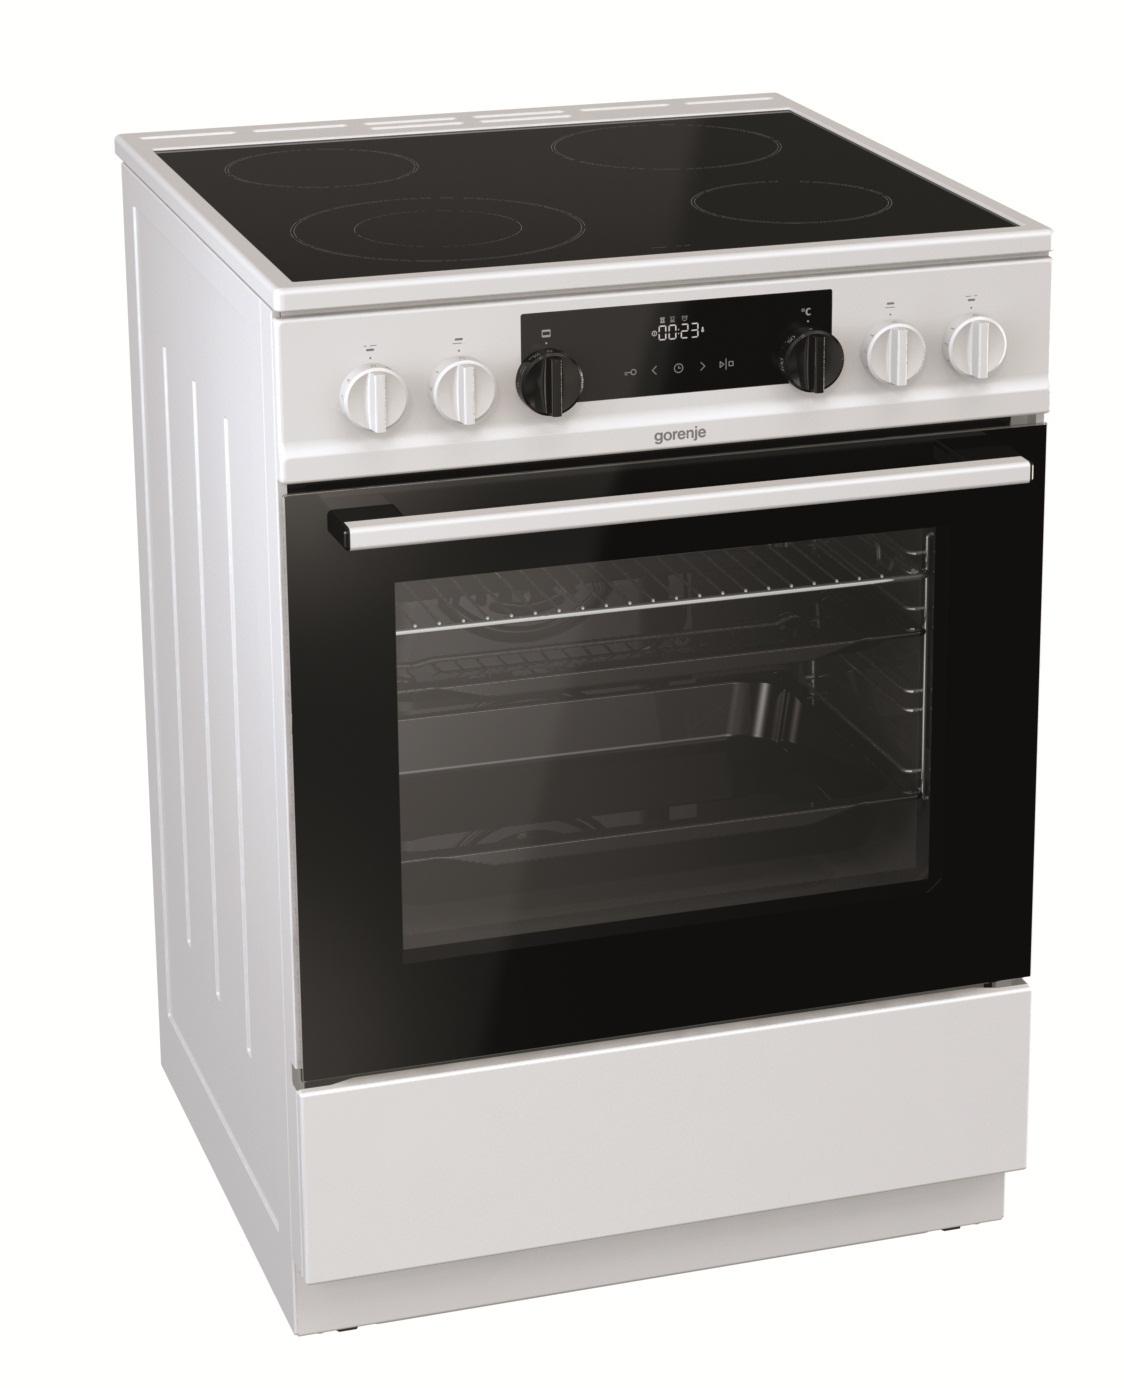 Kuchnia Witroceramiczna Gorenje Ec6351wc 60cm Hit